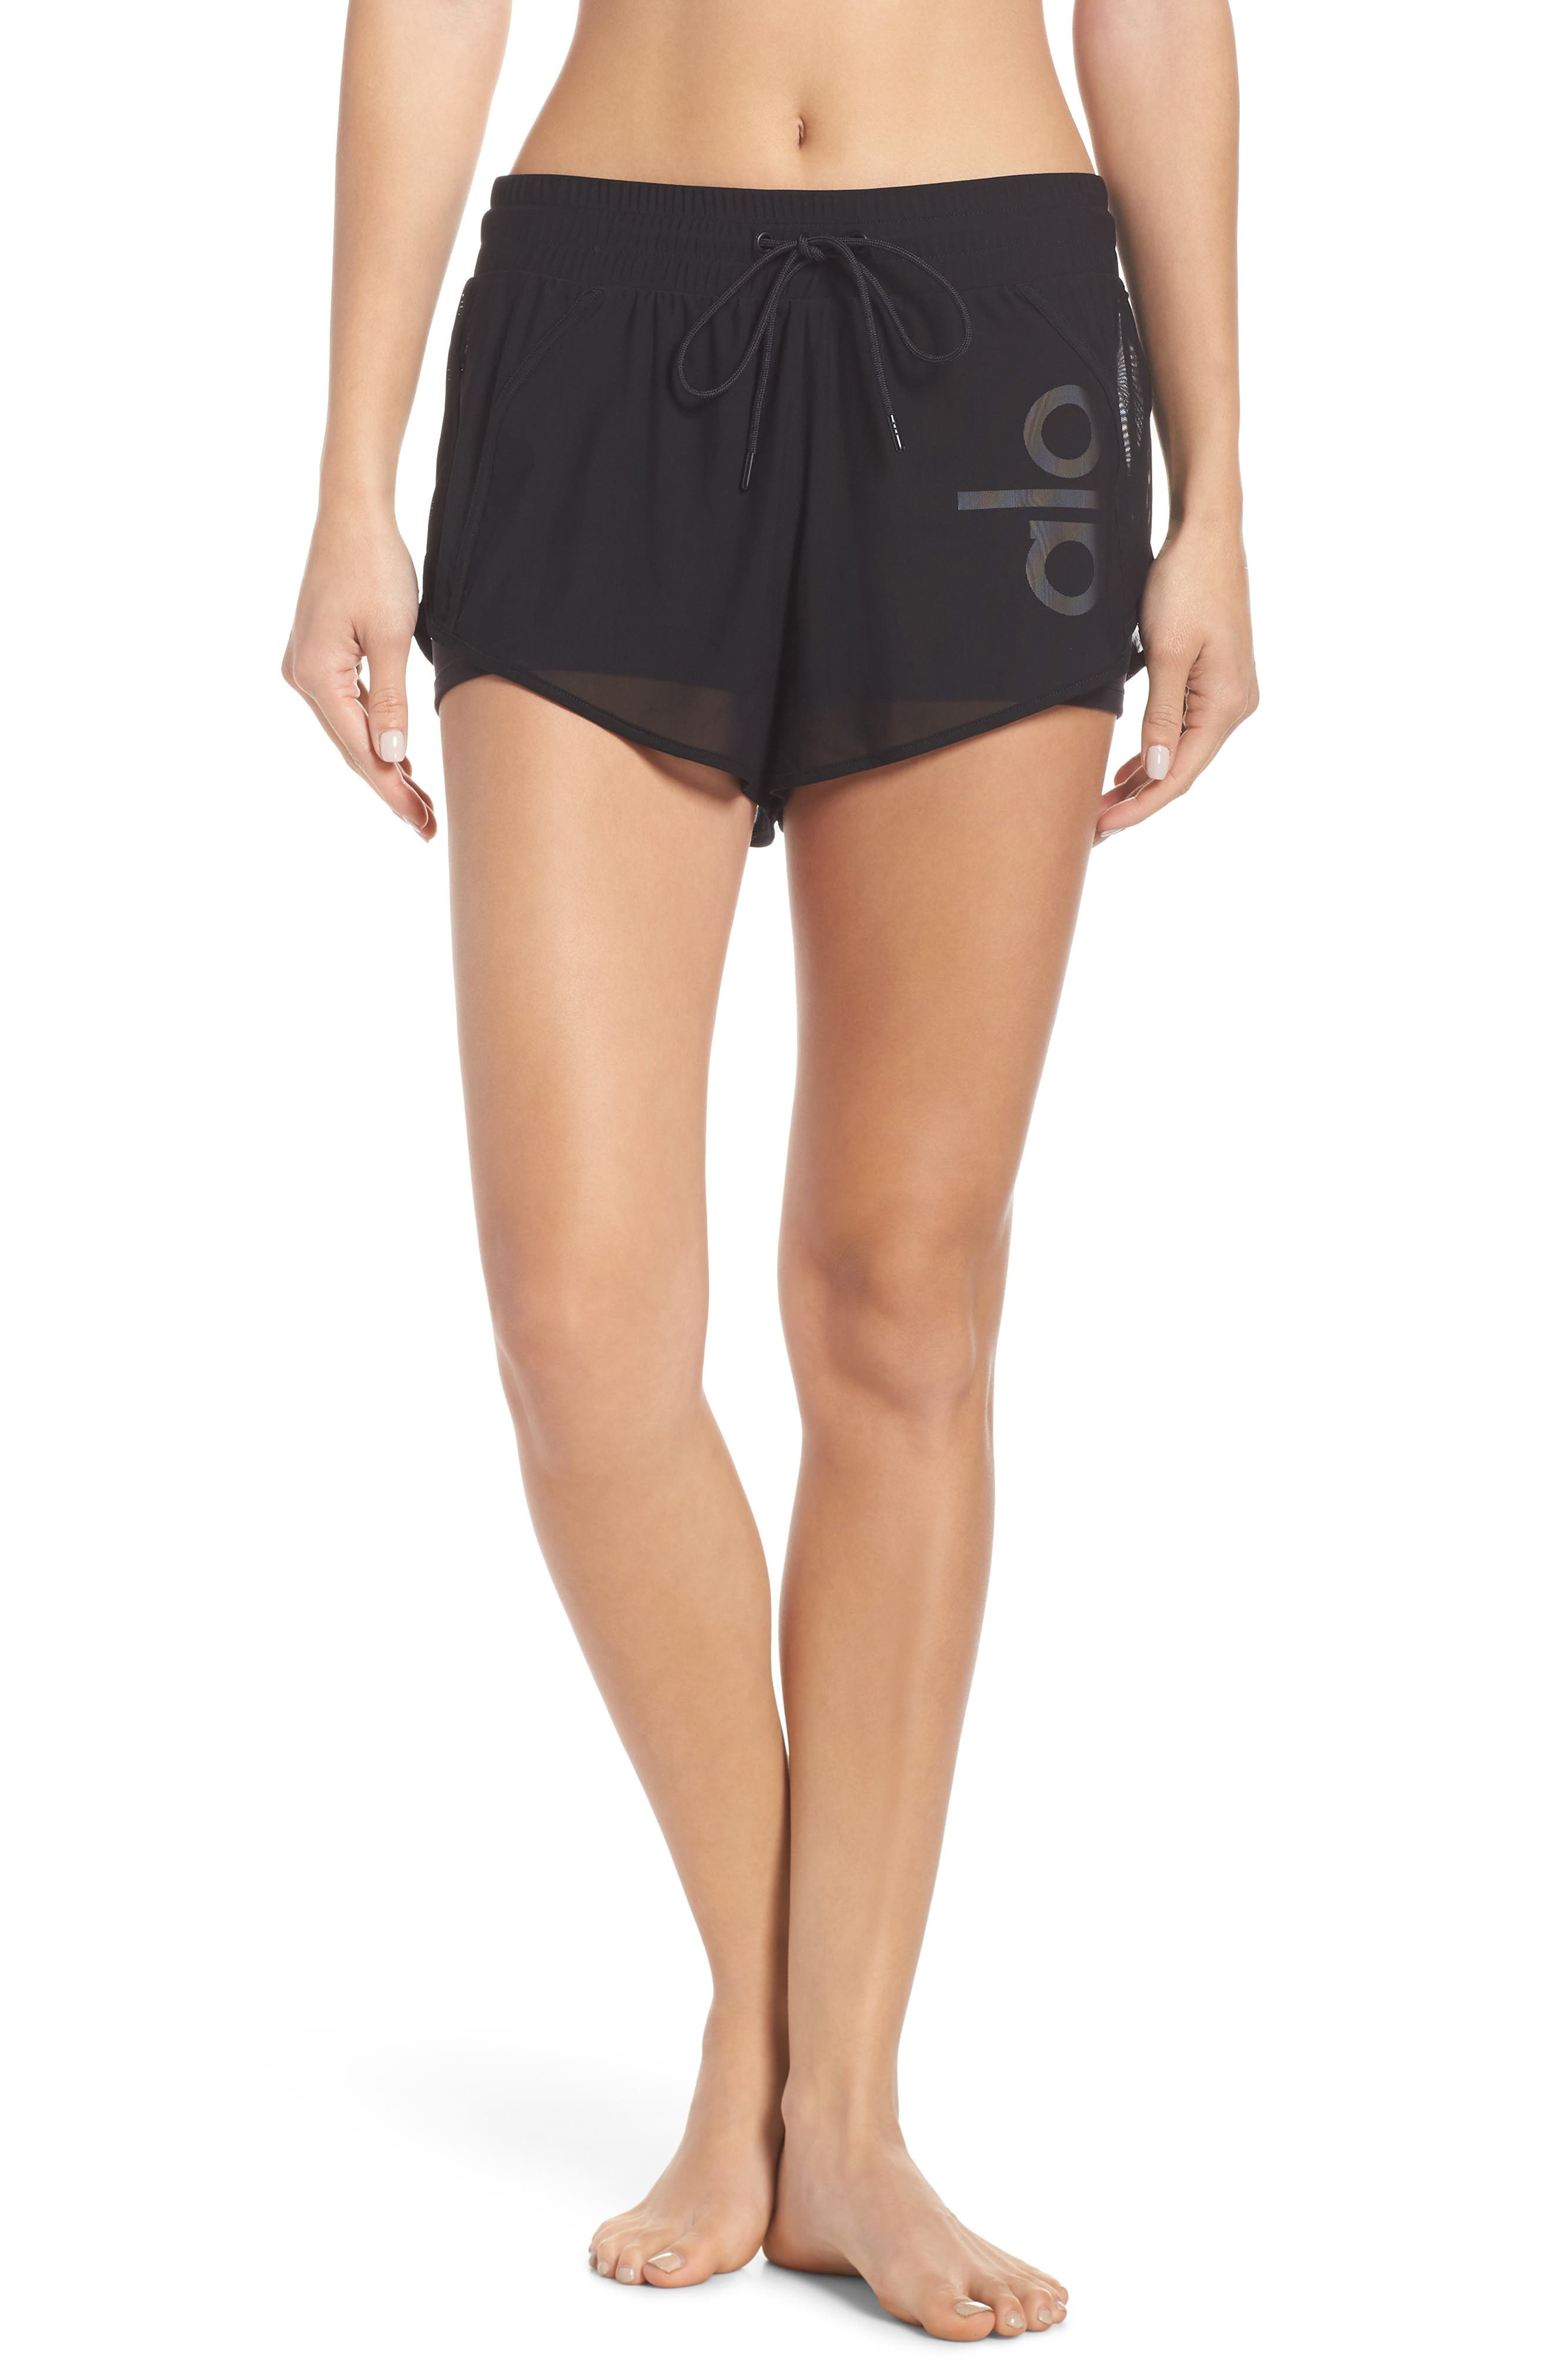 Ambience Shorts,                             Main thumbnail 1, color,                             BLACK/ BLACK/ ALO/ WHITE